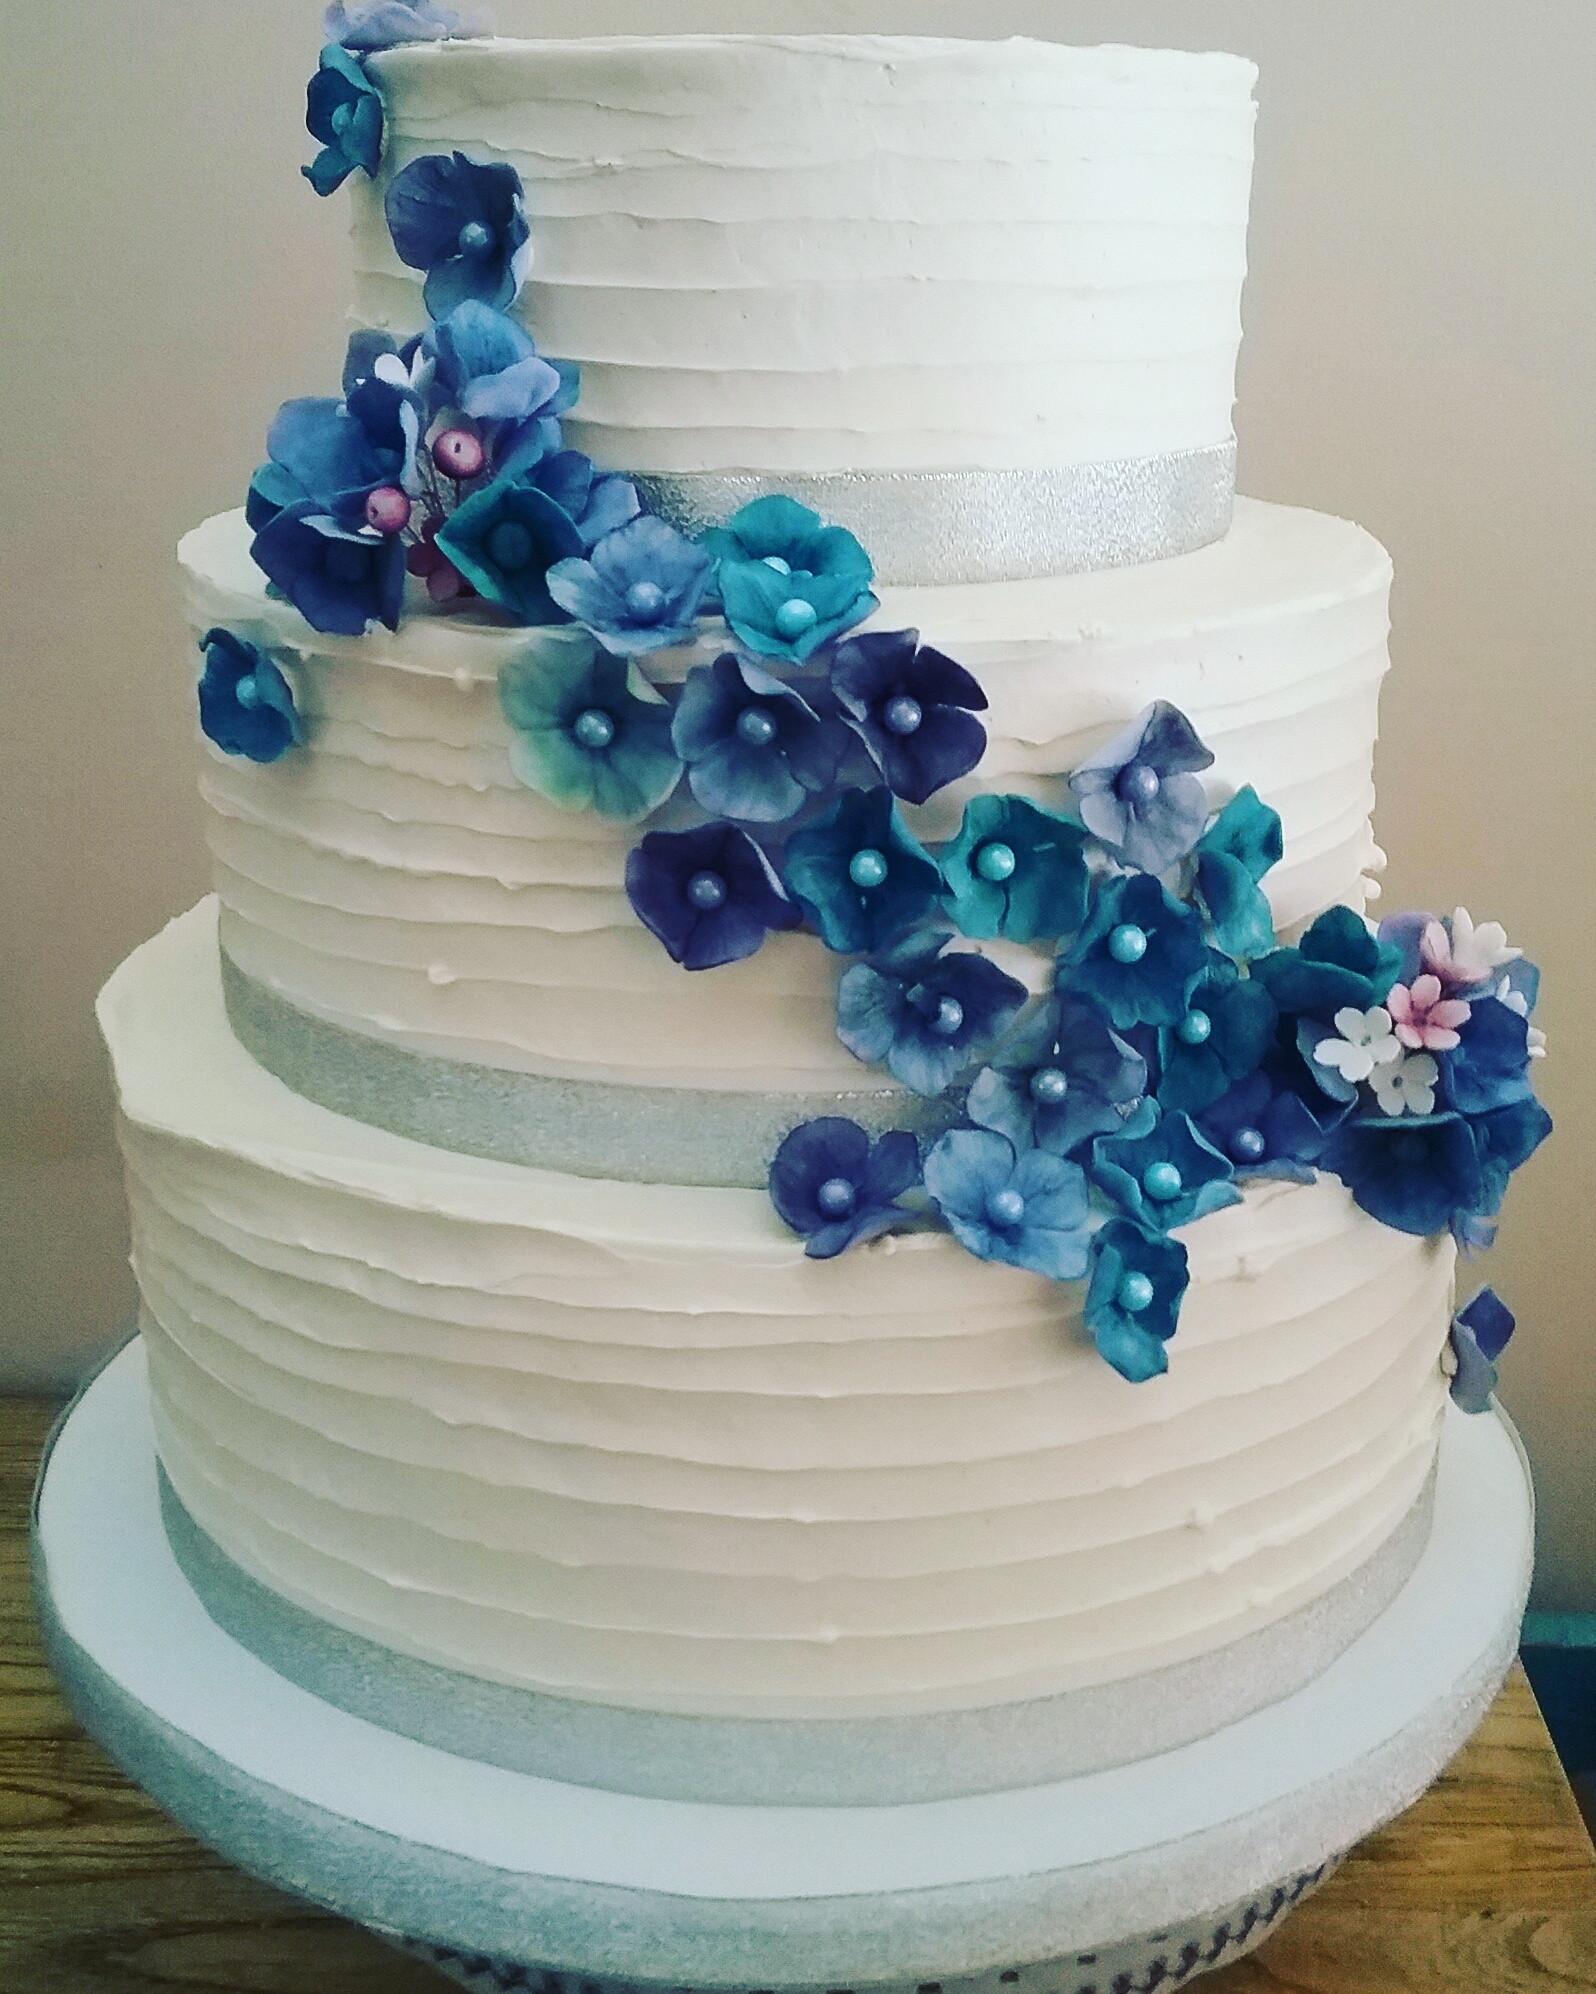 Hydrangeas Wedding Cakes  Hydrangea Wedding Cake CakeCentral